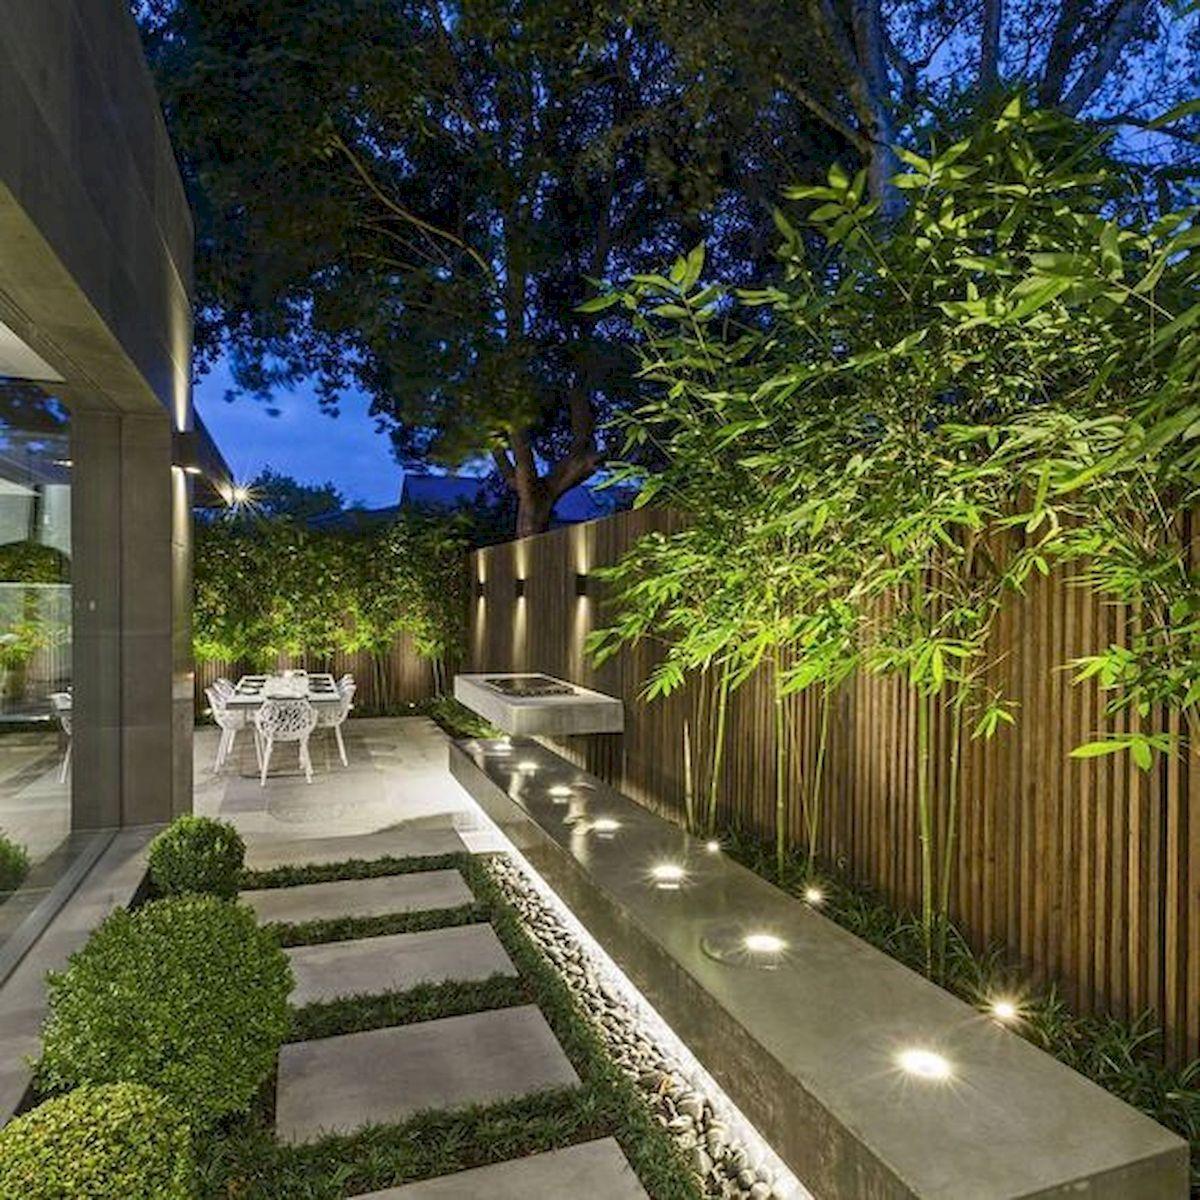 80 Awesome Backyards Garden Lighting Design Ideas Worldecor Co Outdoor Gardens Design Garden Lighting Design Side Yard Landscaping